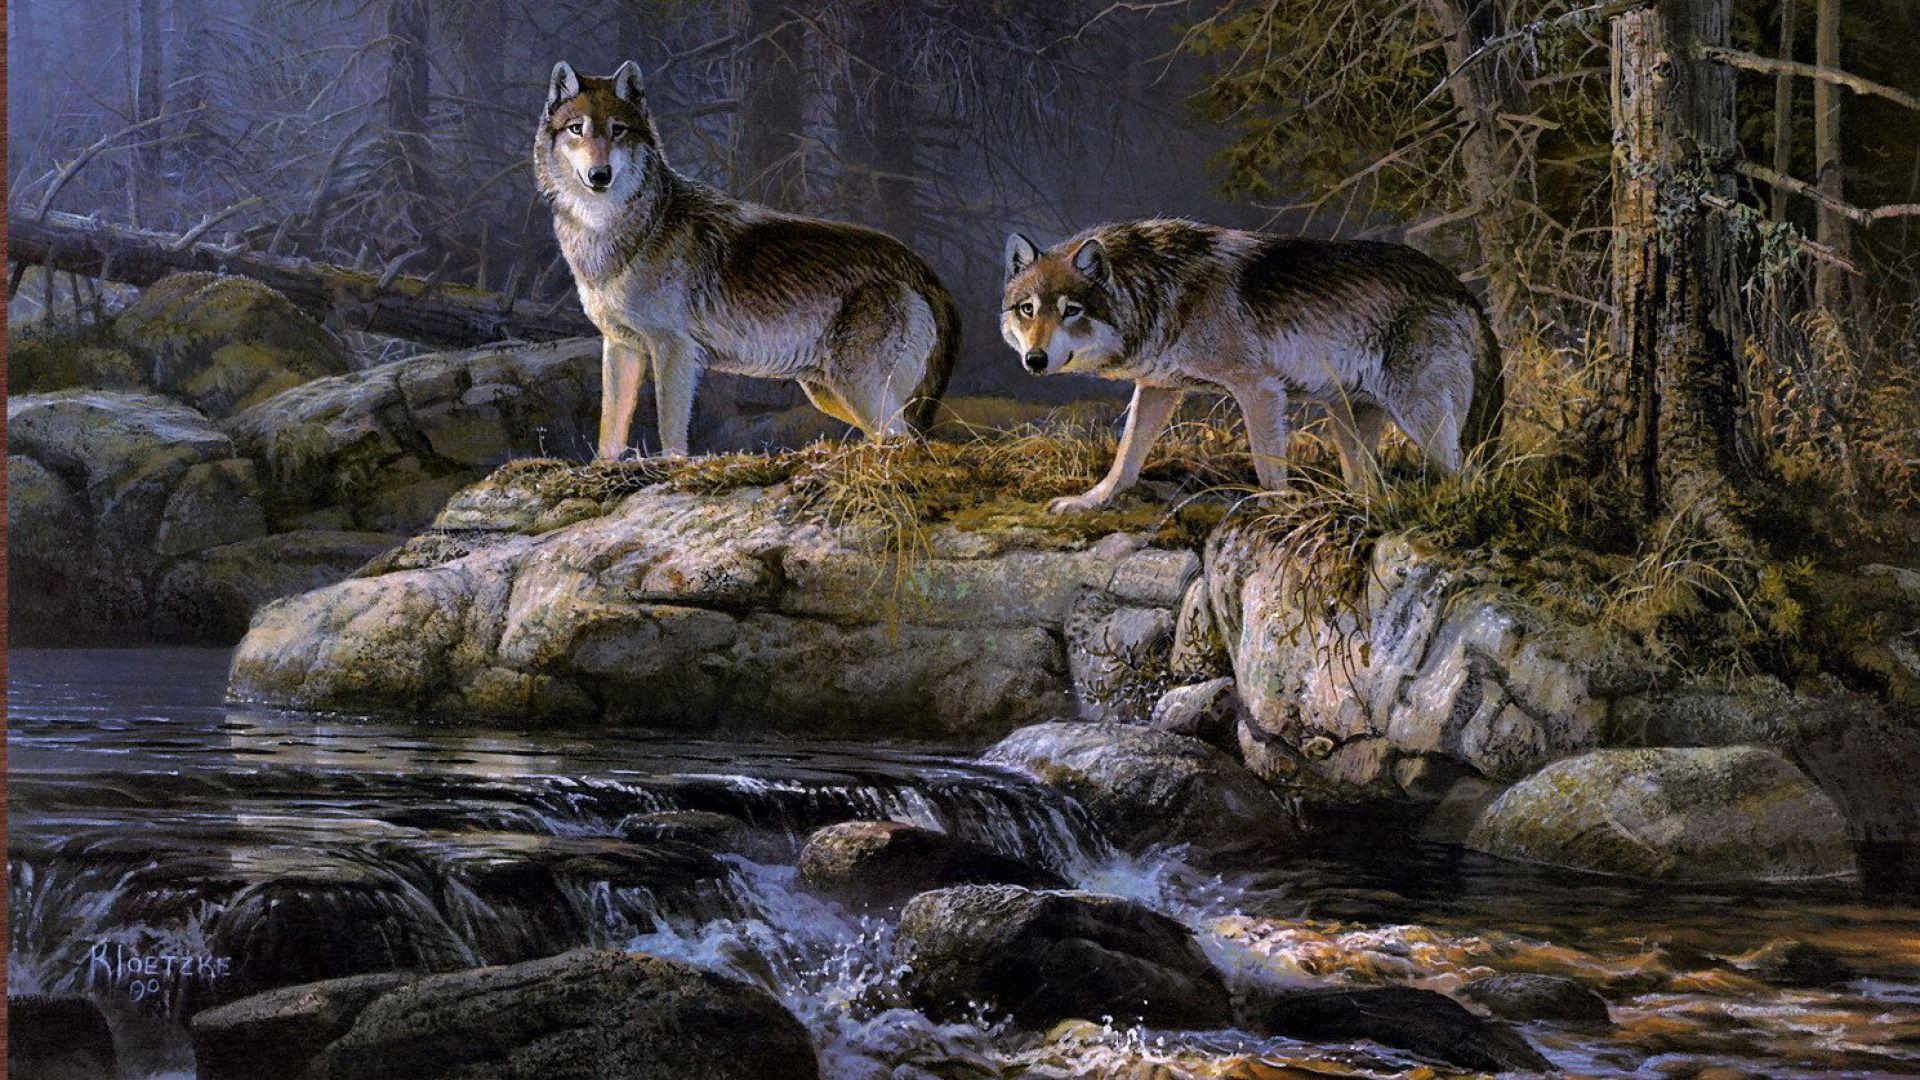 Wild Animal Wolf Wallpapers Hd 51074 Wallpaper: Download Wallpaper ID 1487285